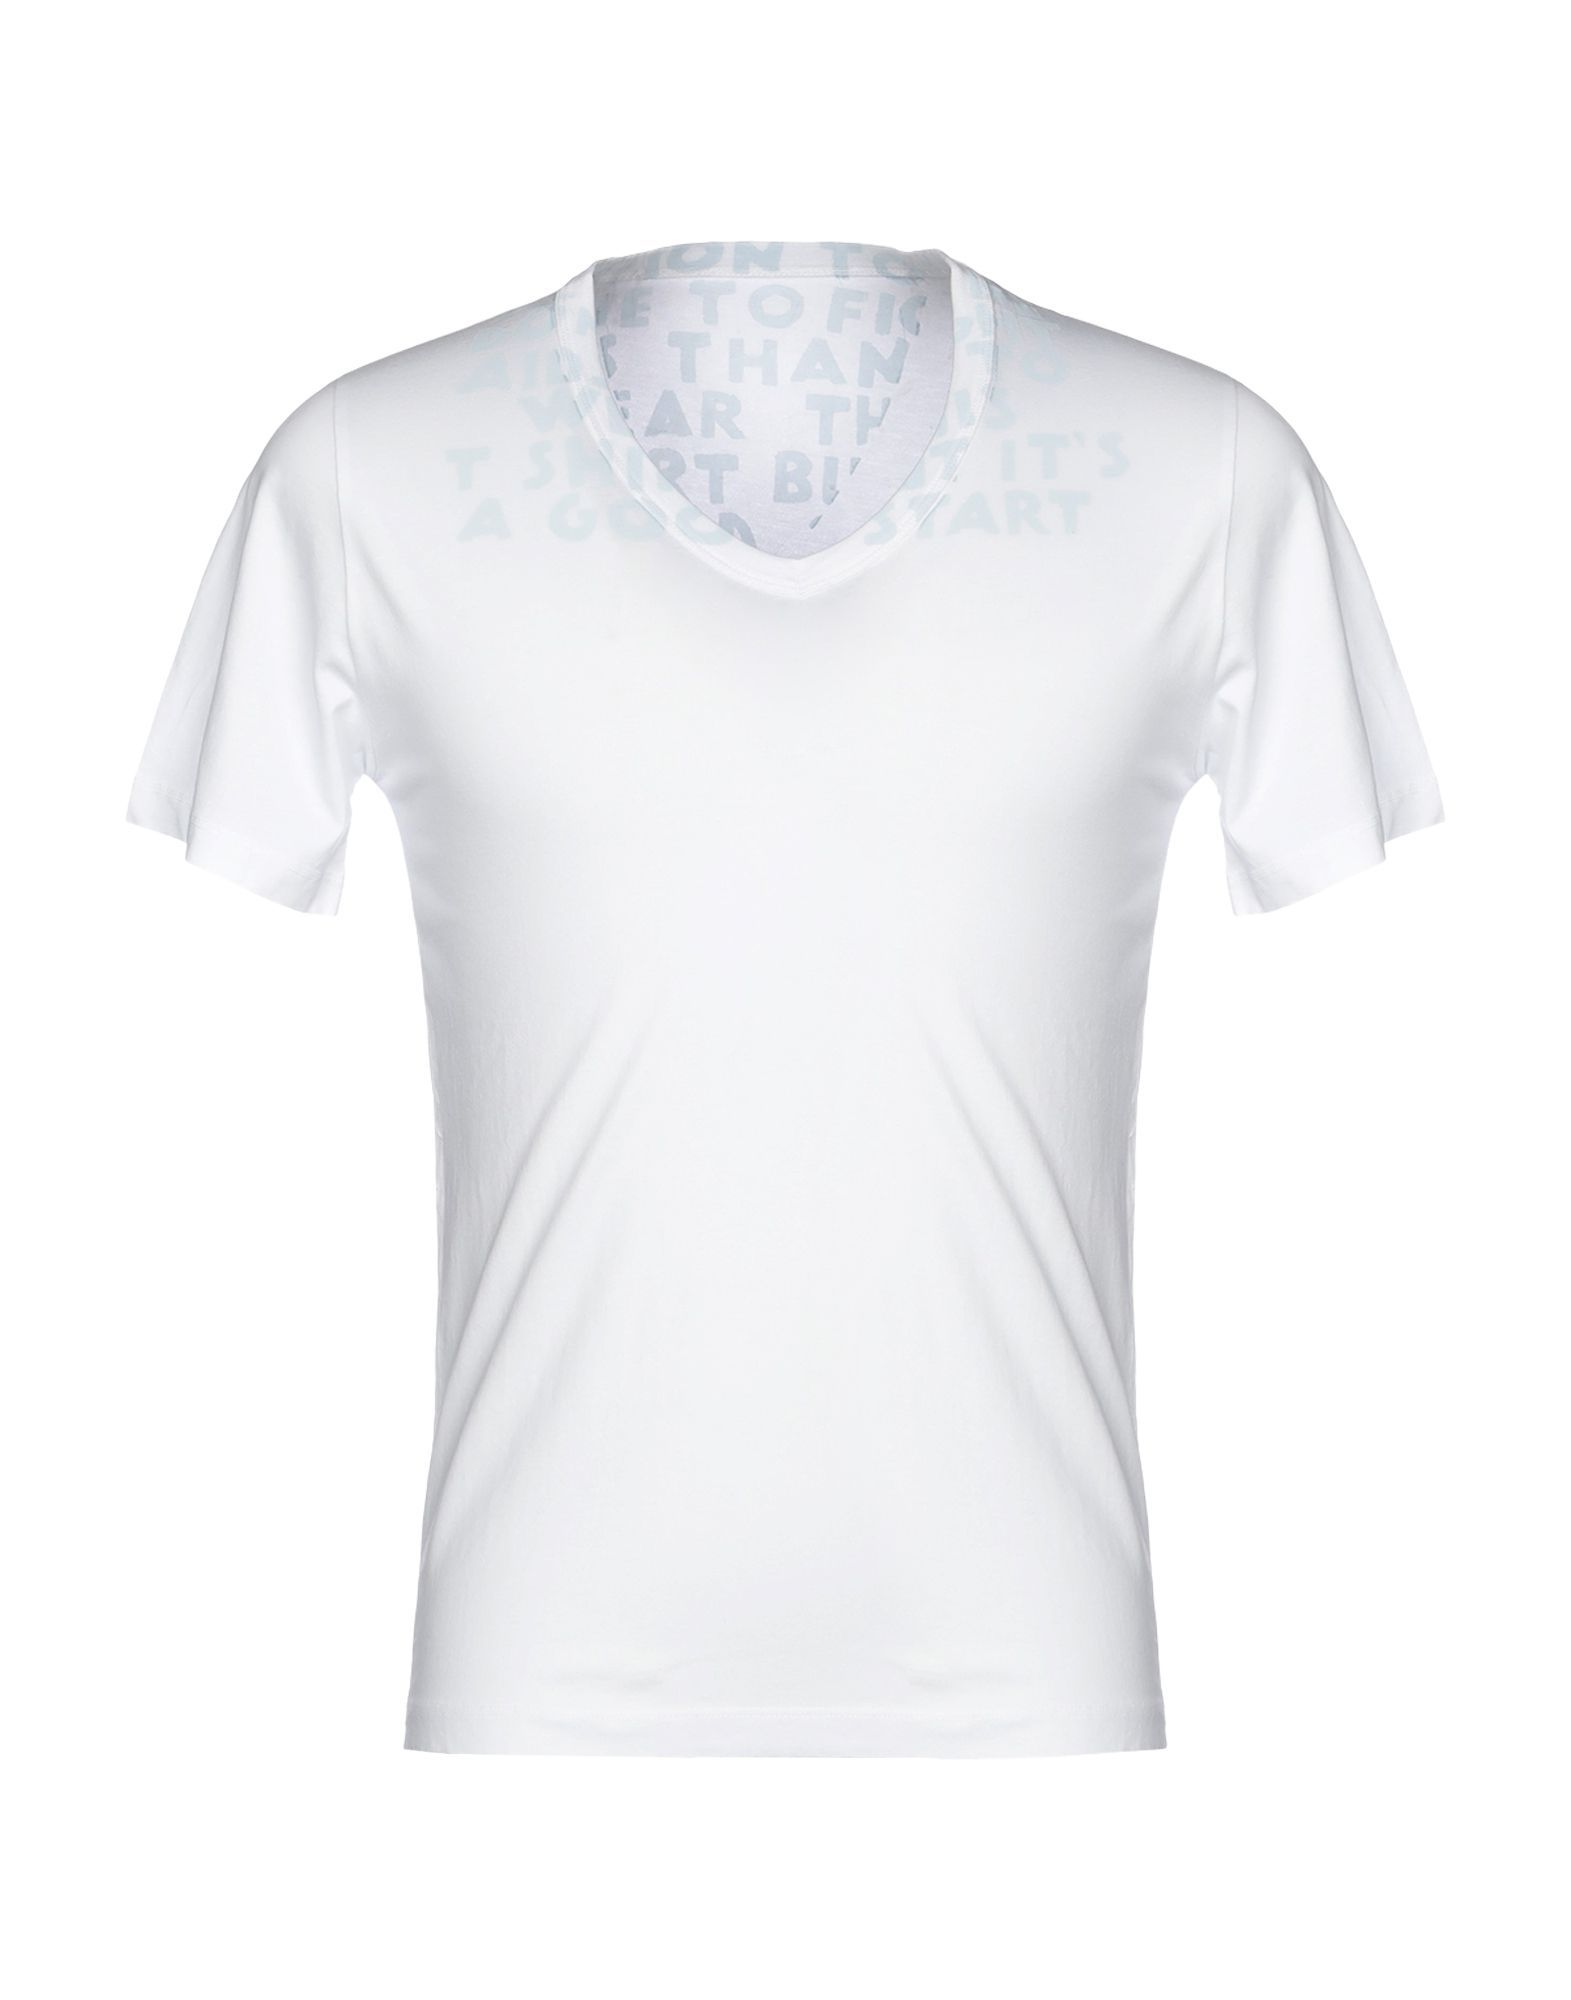 f9ec309012a MAISON MARGIELA T-SHIRTS.  maisonmargiela  cloth